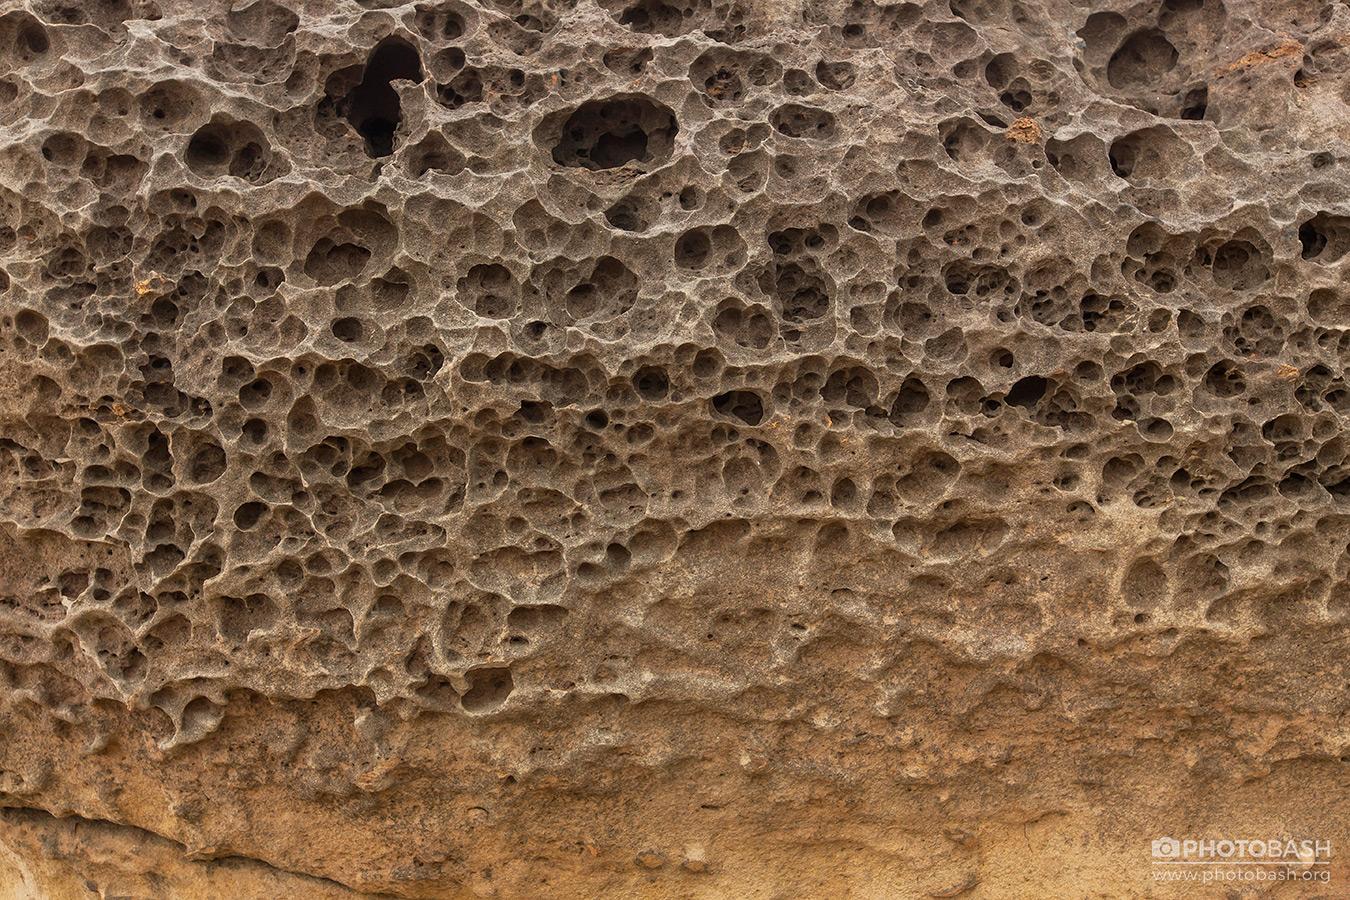 Porous-Rocks-Holes-Eroded-Texture.jpg